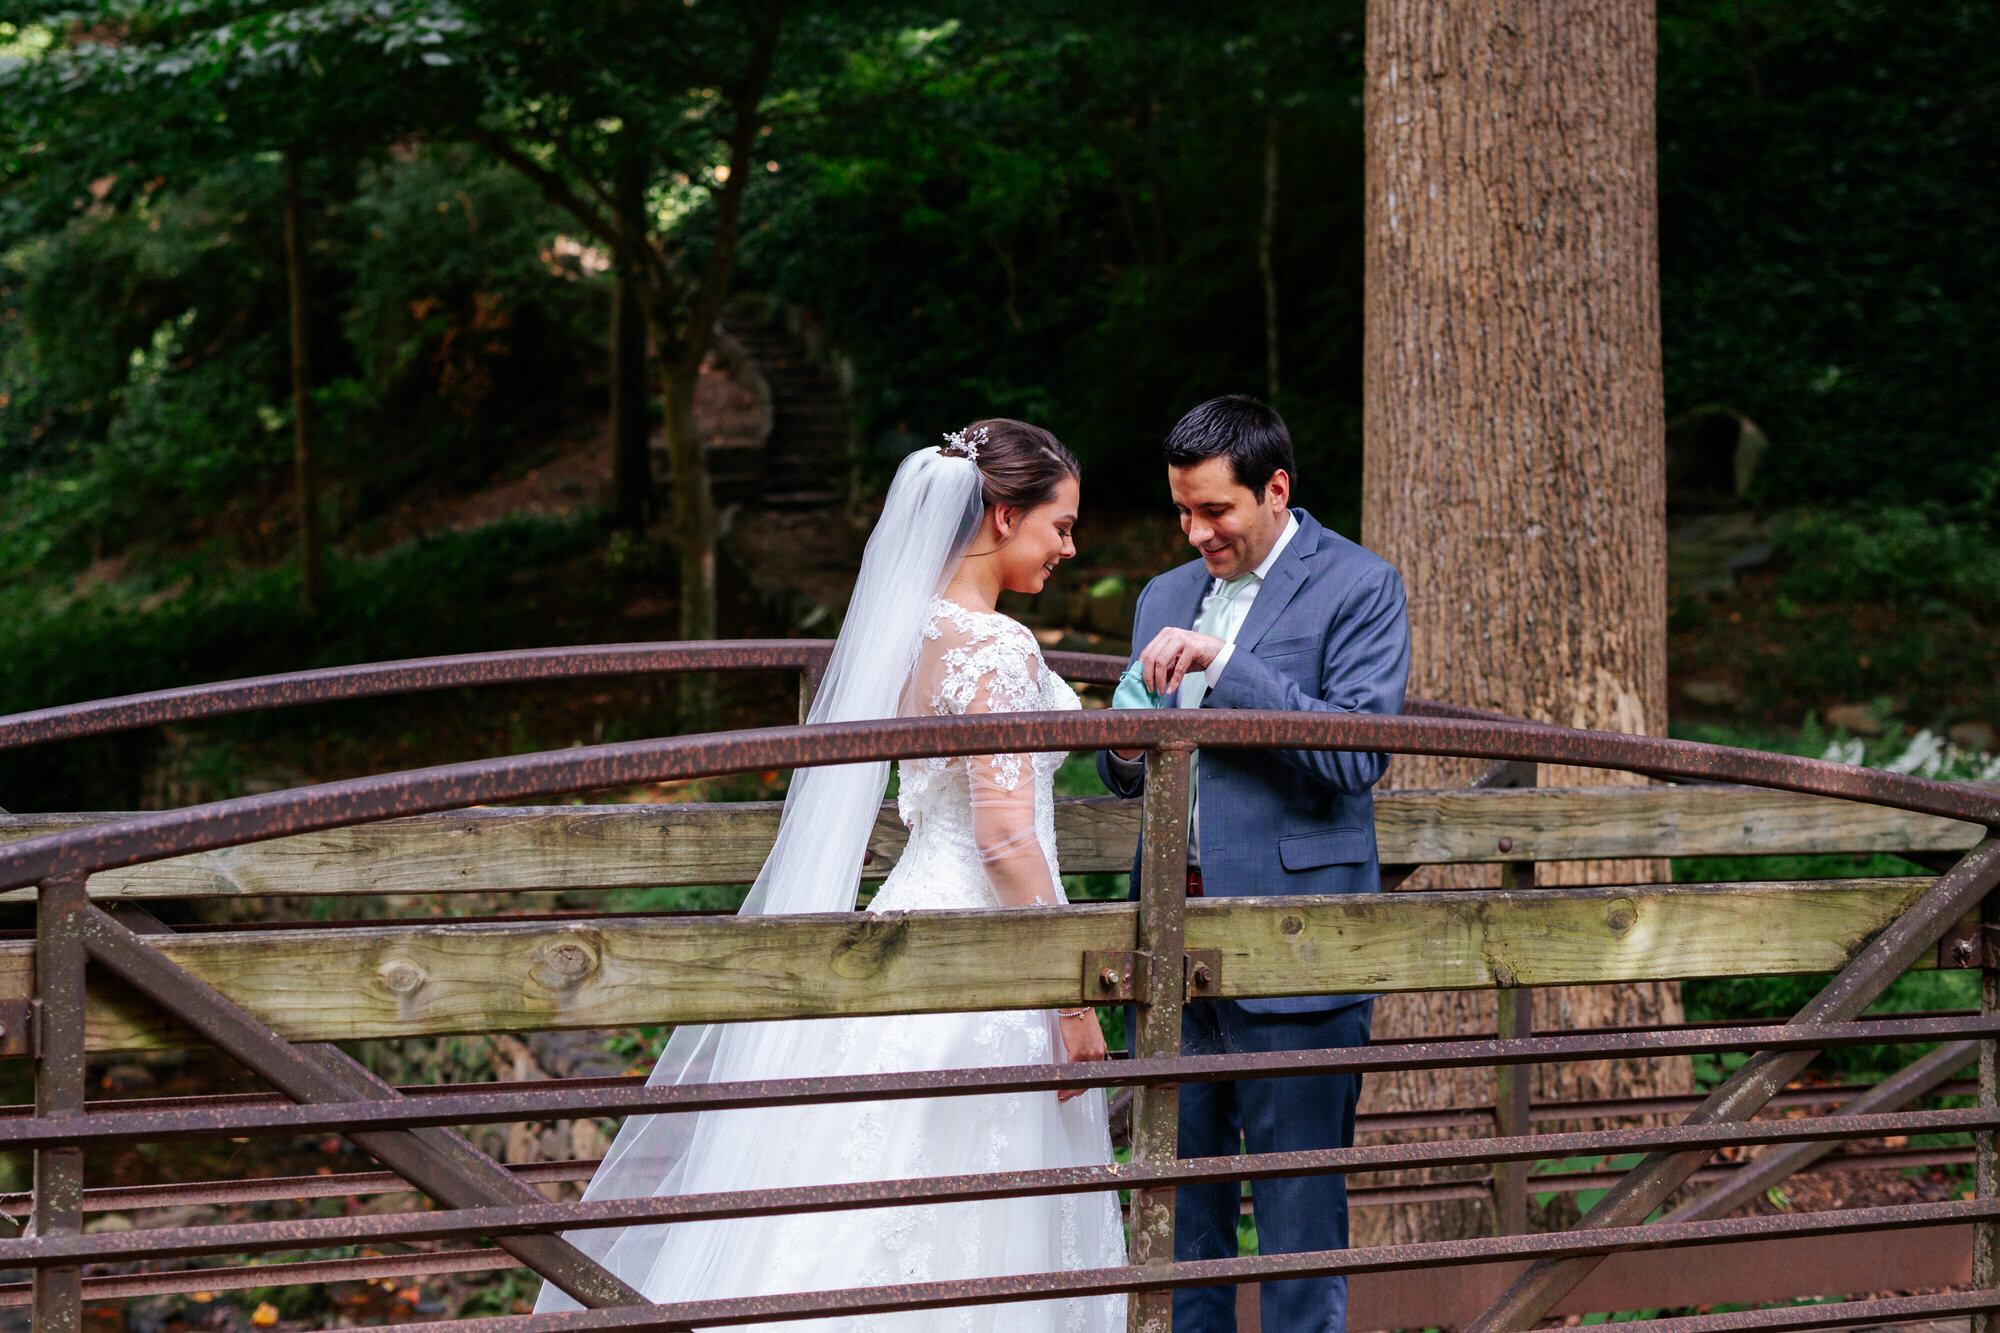 twigs-tempietto-wedding-greenville-downtown-285.JPG